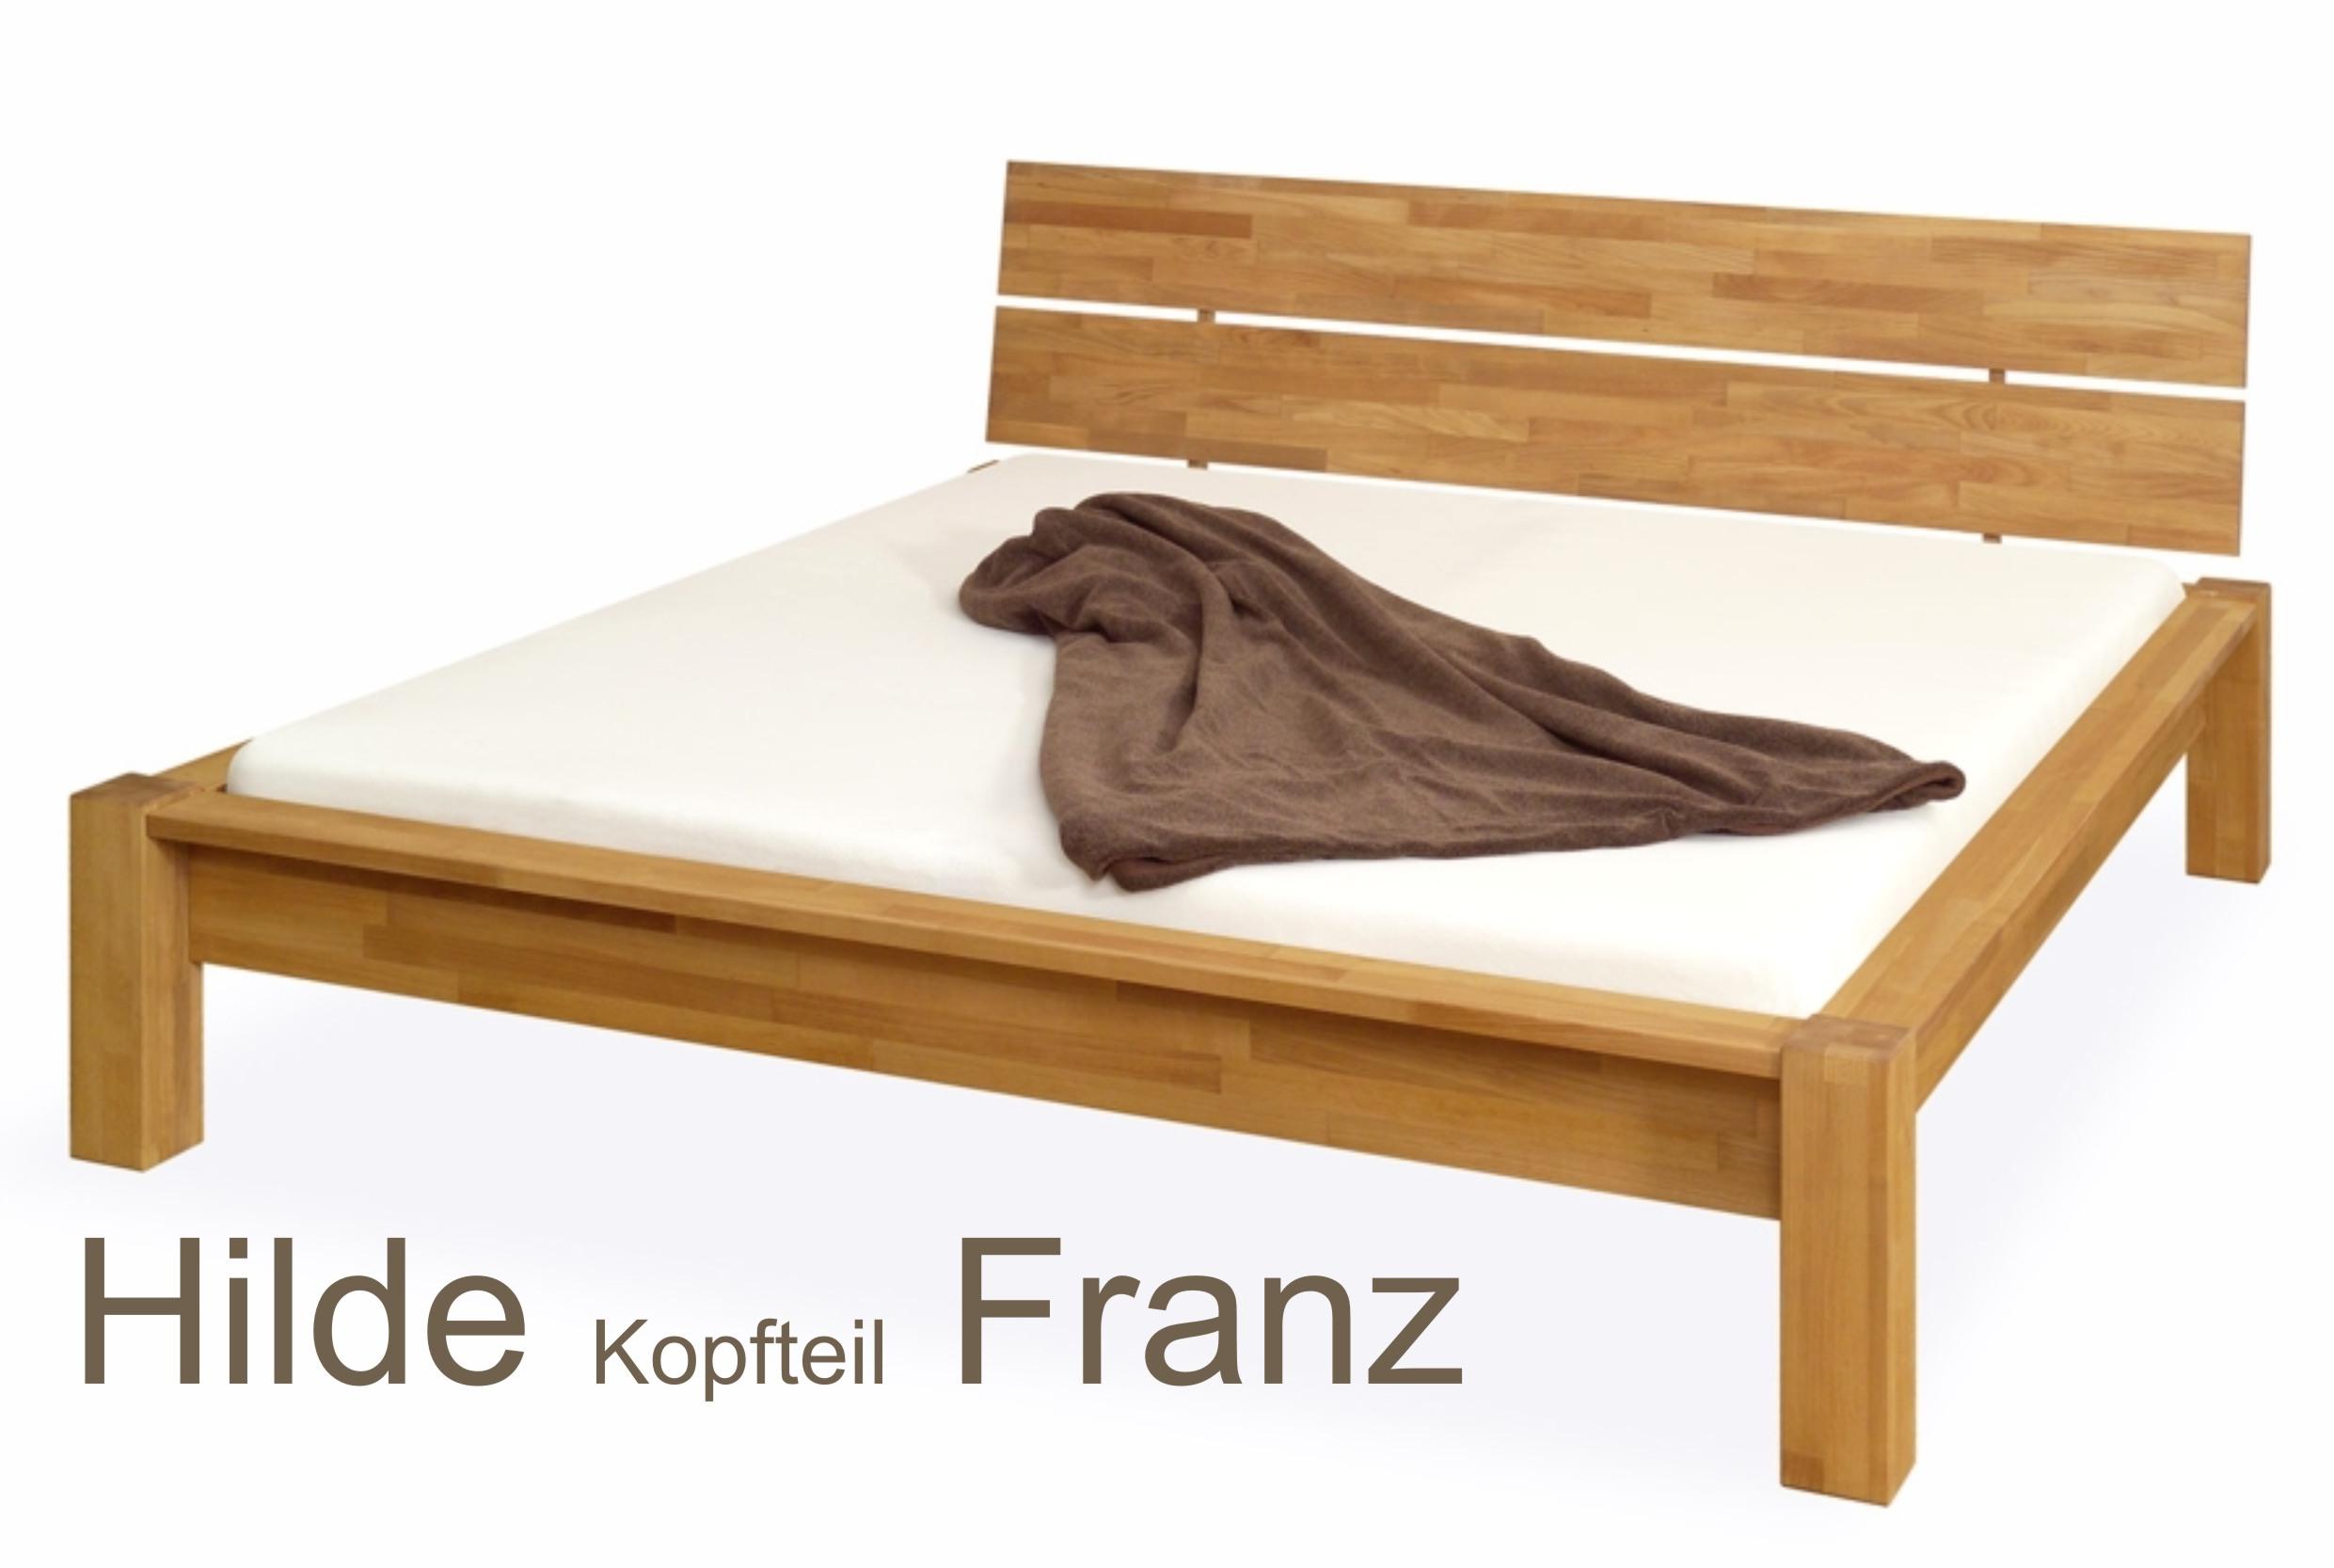 Full Size of Bett Holz Betten Köln Selber Zusammenstellen Schlafzimmer Massivholz Regal Stauraum 160x200 Günstiges 140x220 Holzregal Küche Mit Schubladen 90x200 200x200 Bett Bett Holz